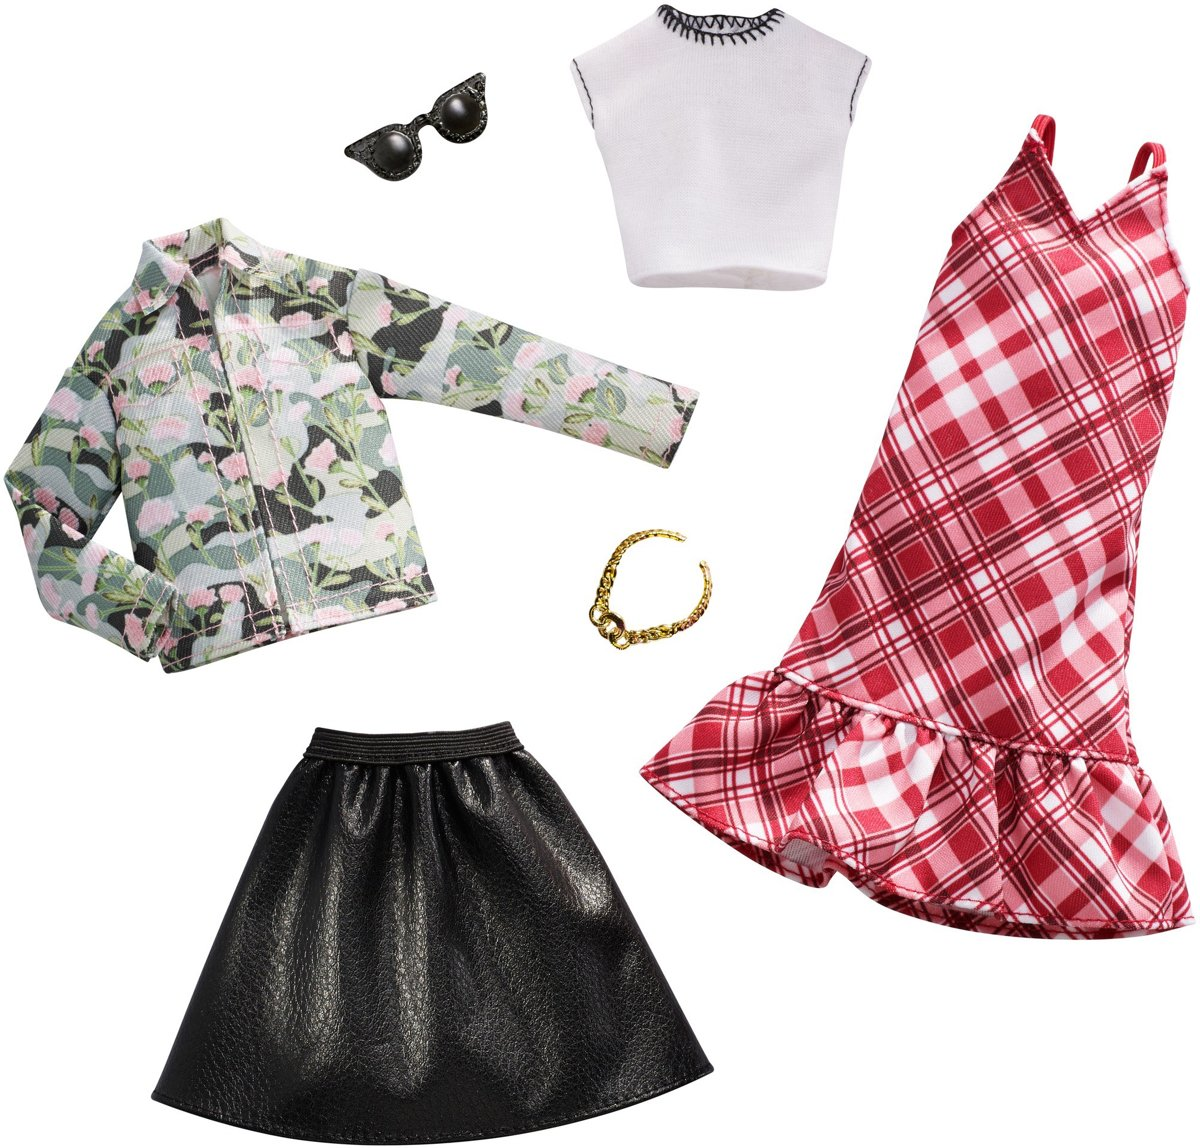 Barbie Kledingsetje Floral Camo Plaid - 2 Outfits